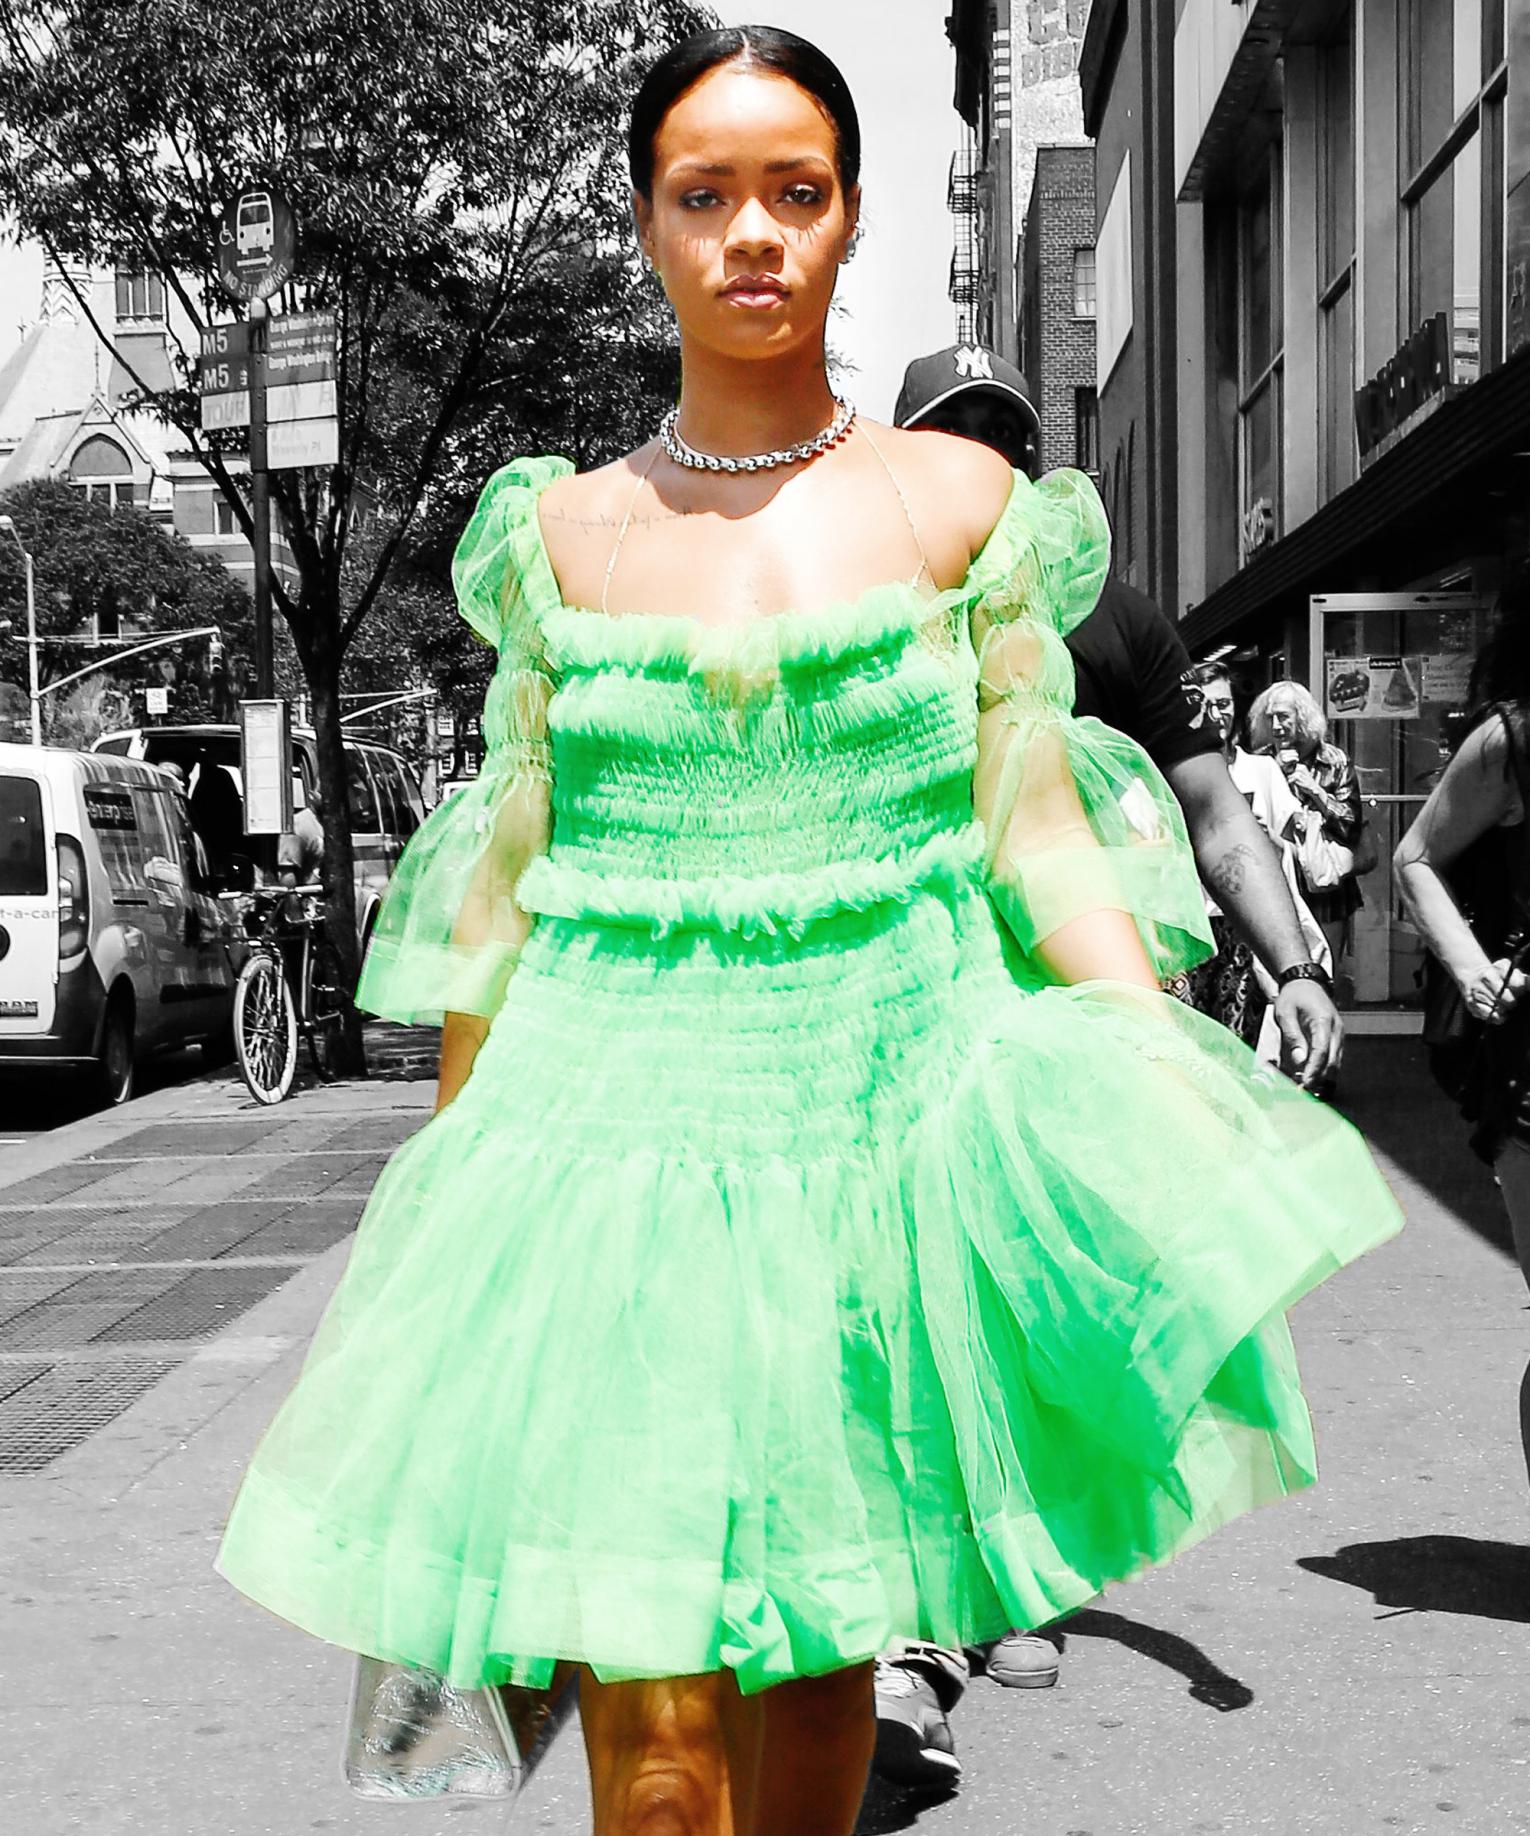 Rihanna S Style Guide For Beating The Heat Rihanna Style Fashion Week Inspiration Green Tutu [ 1836 x 1530 Pixel ]